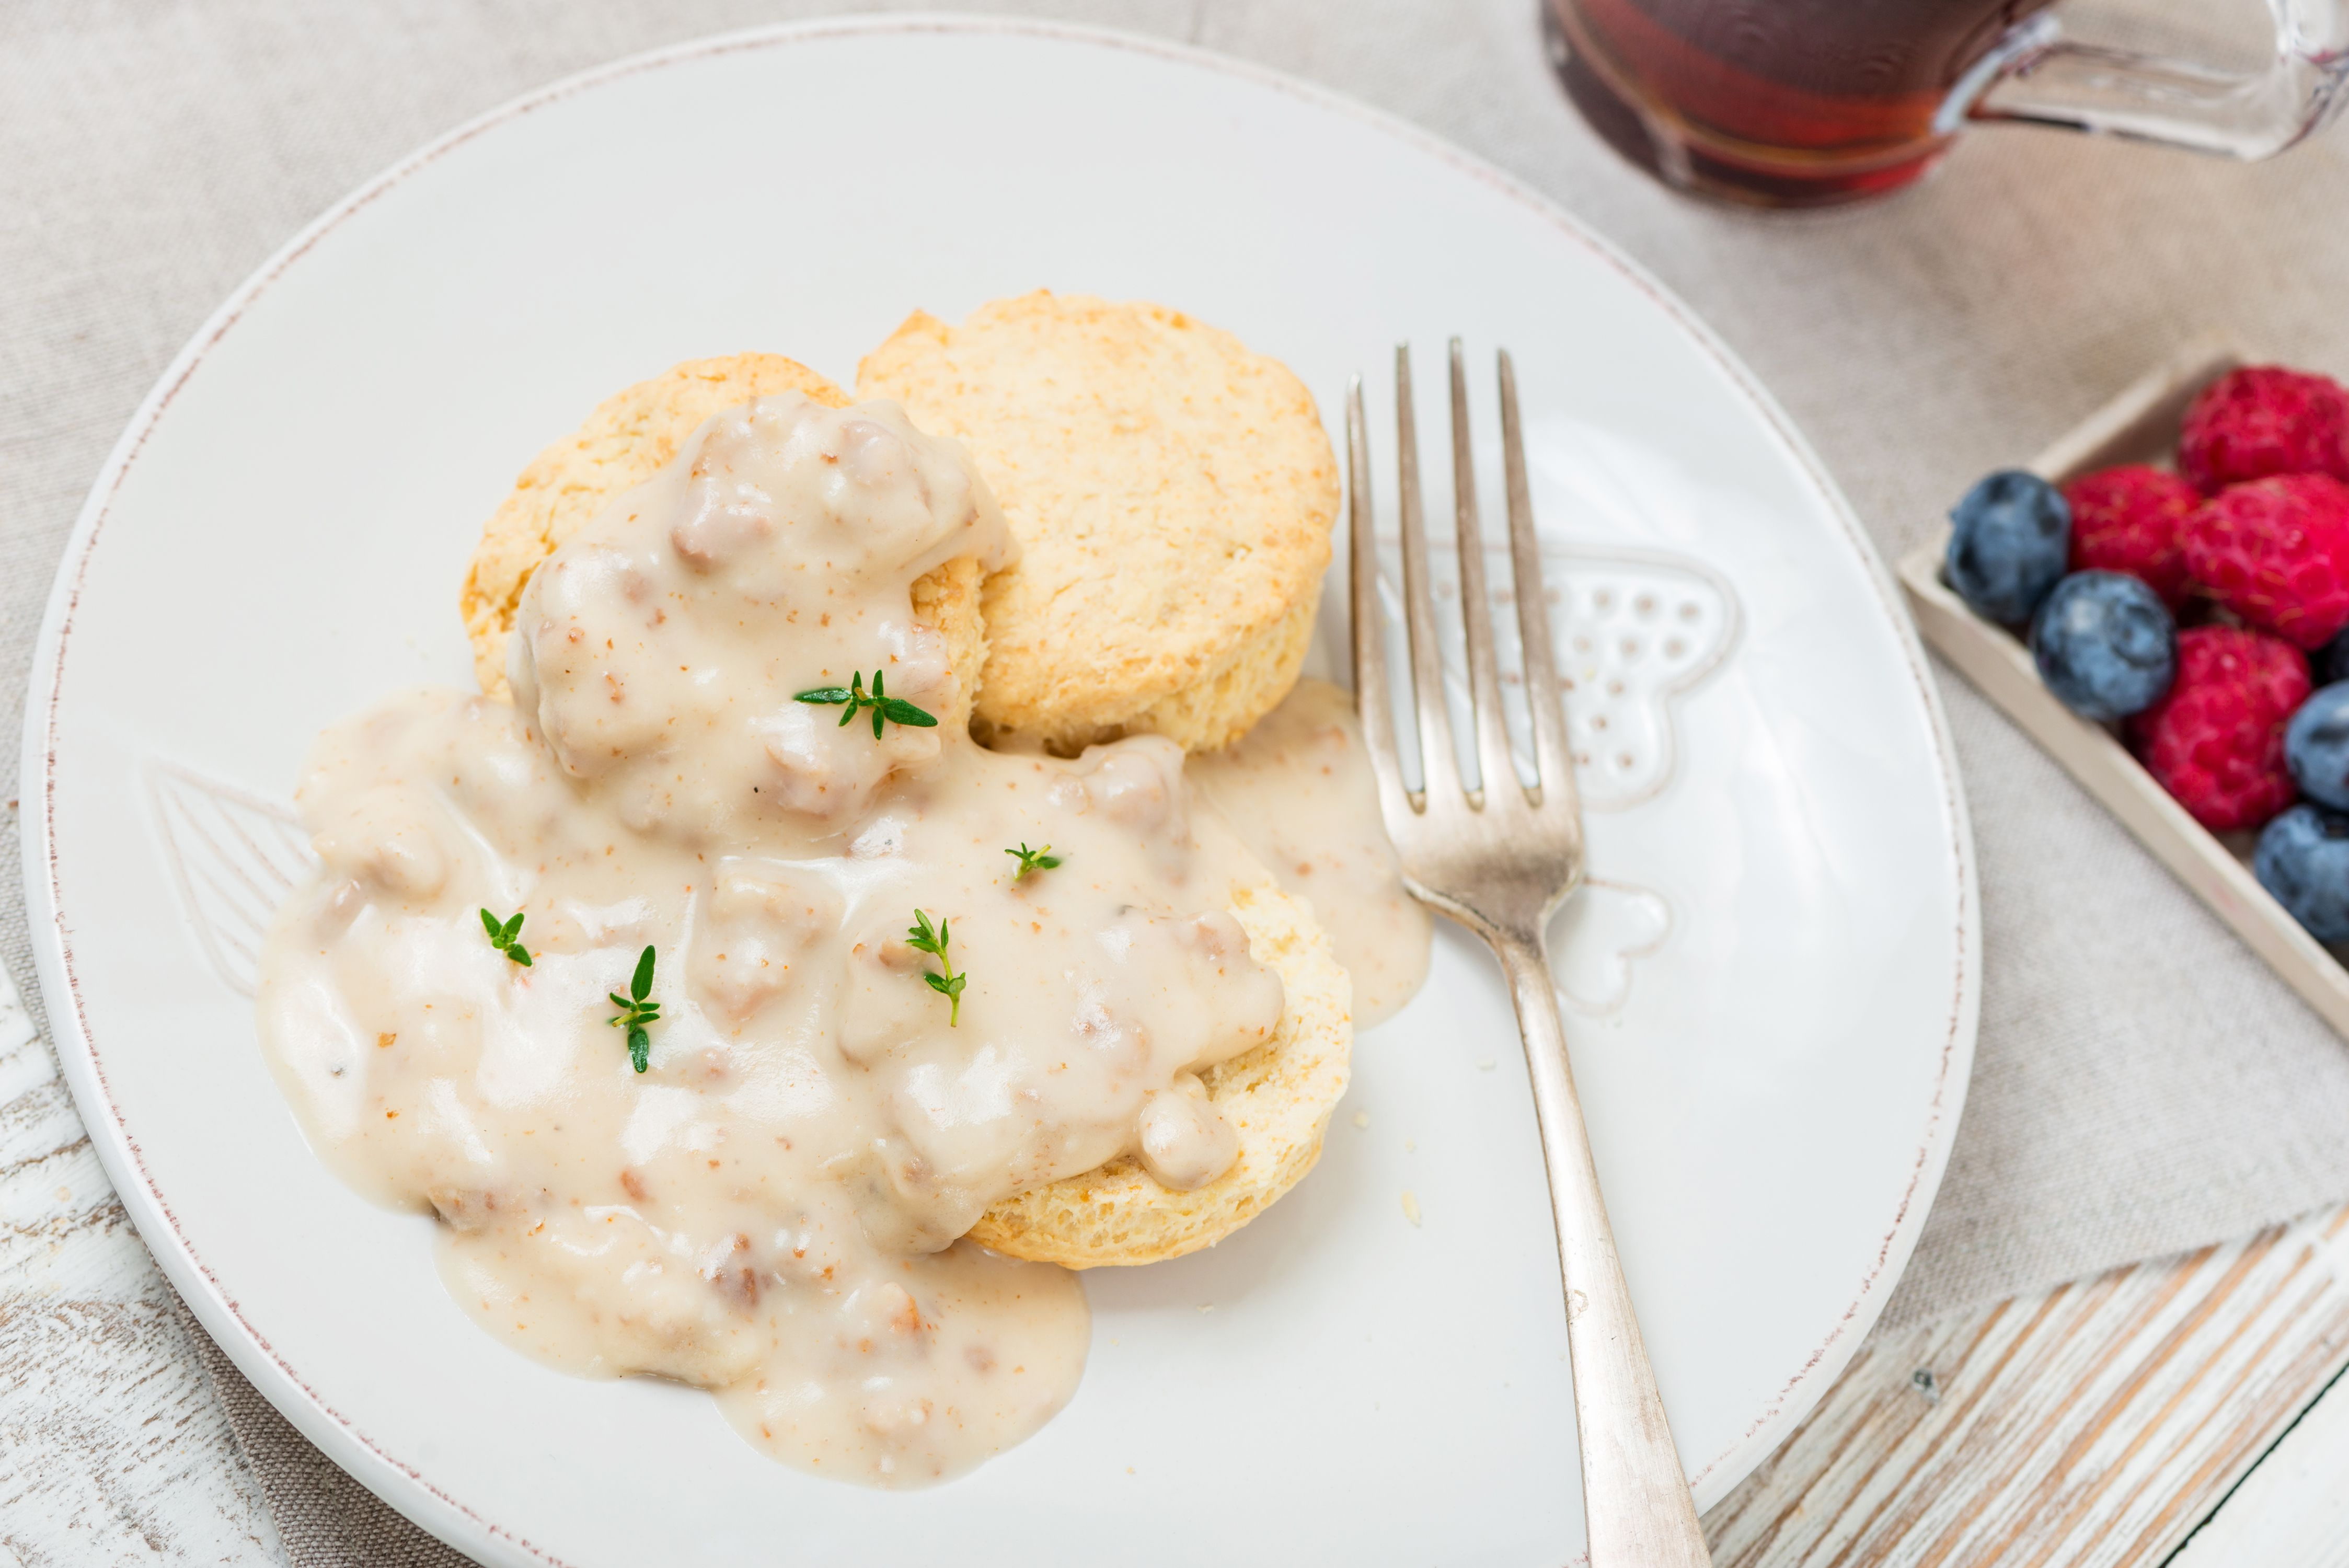 Serve sausage gravy over biscuits